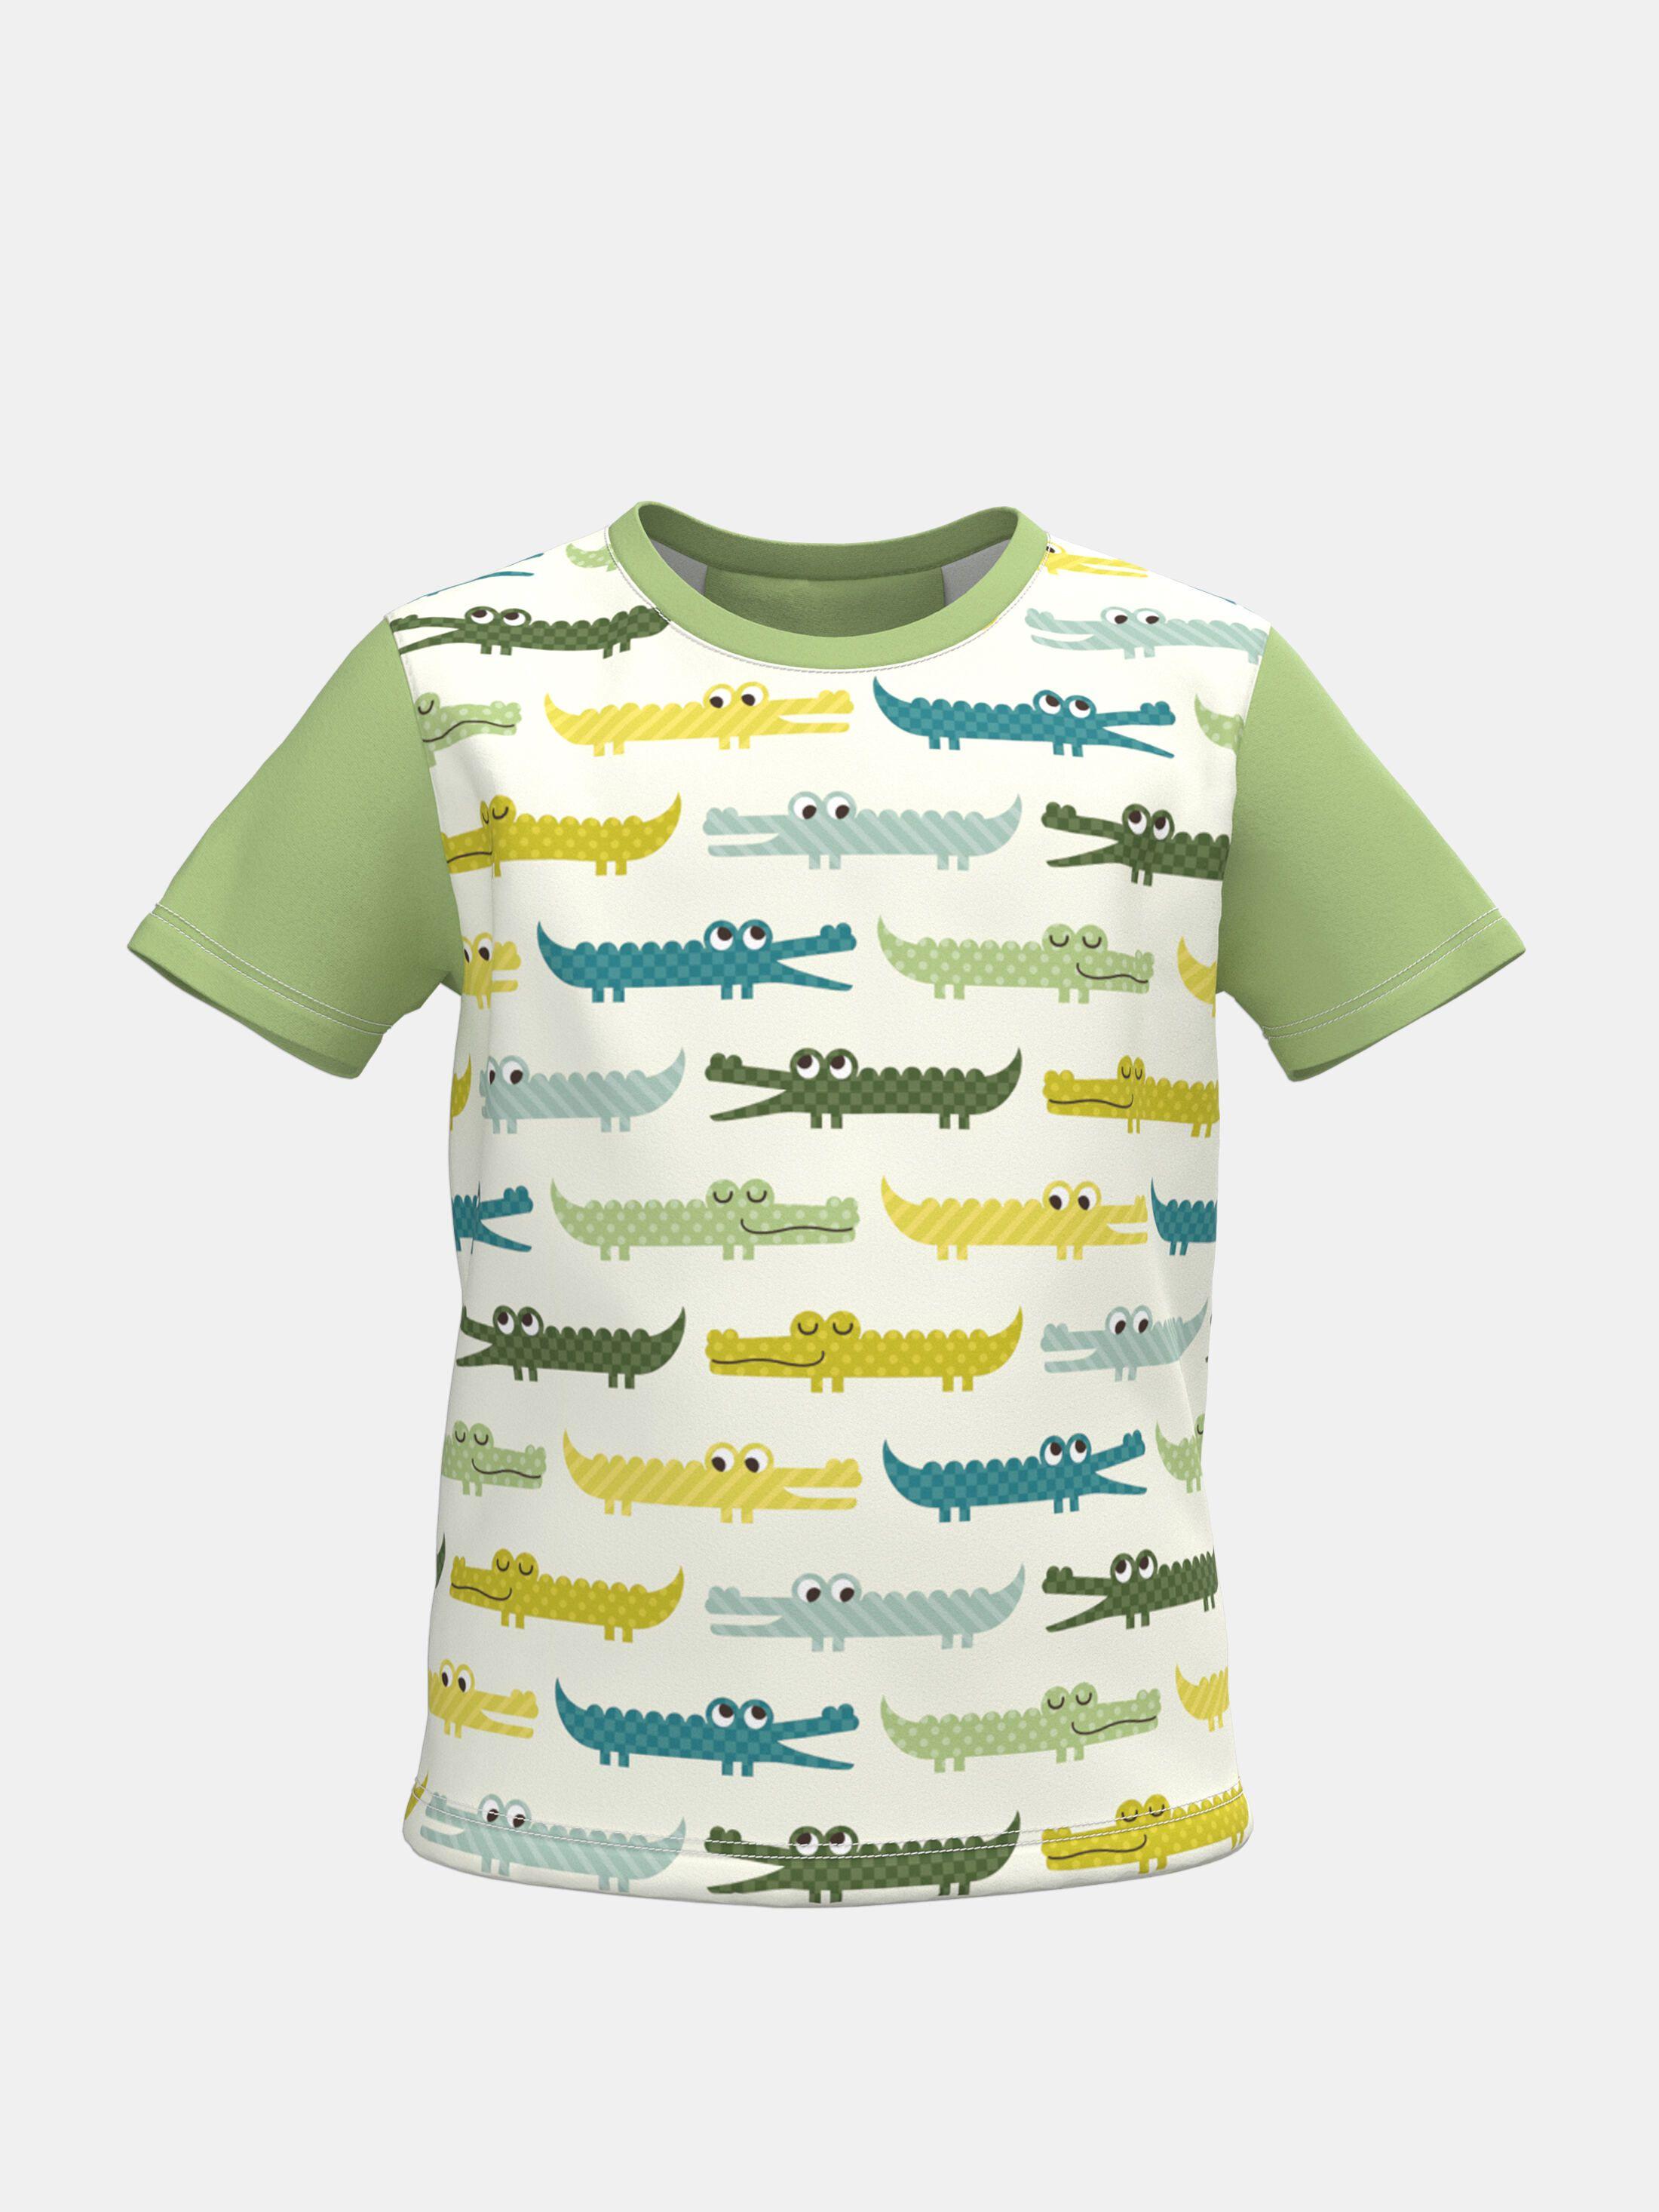 printed childrens t shirts